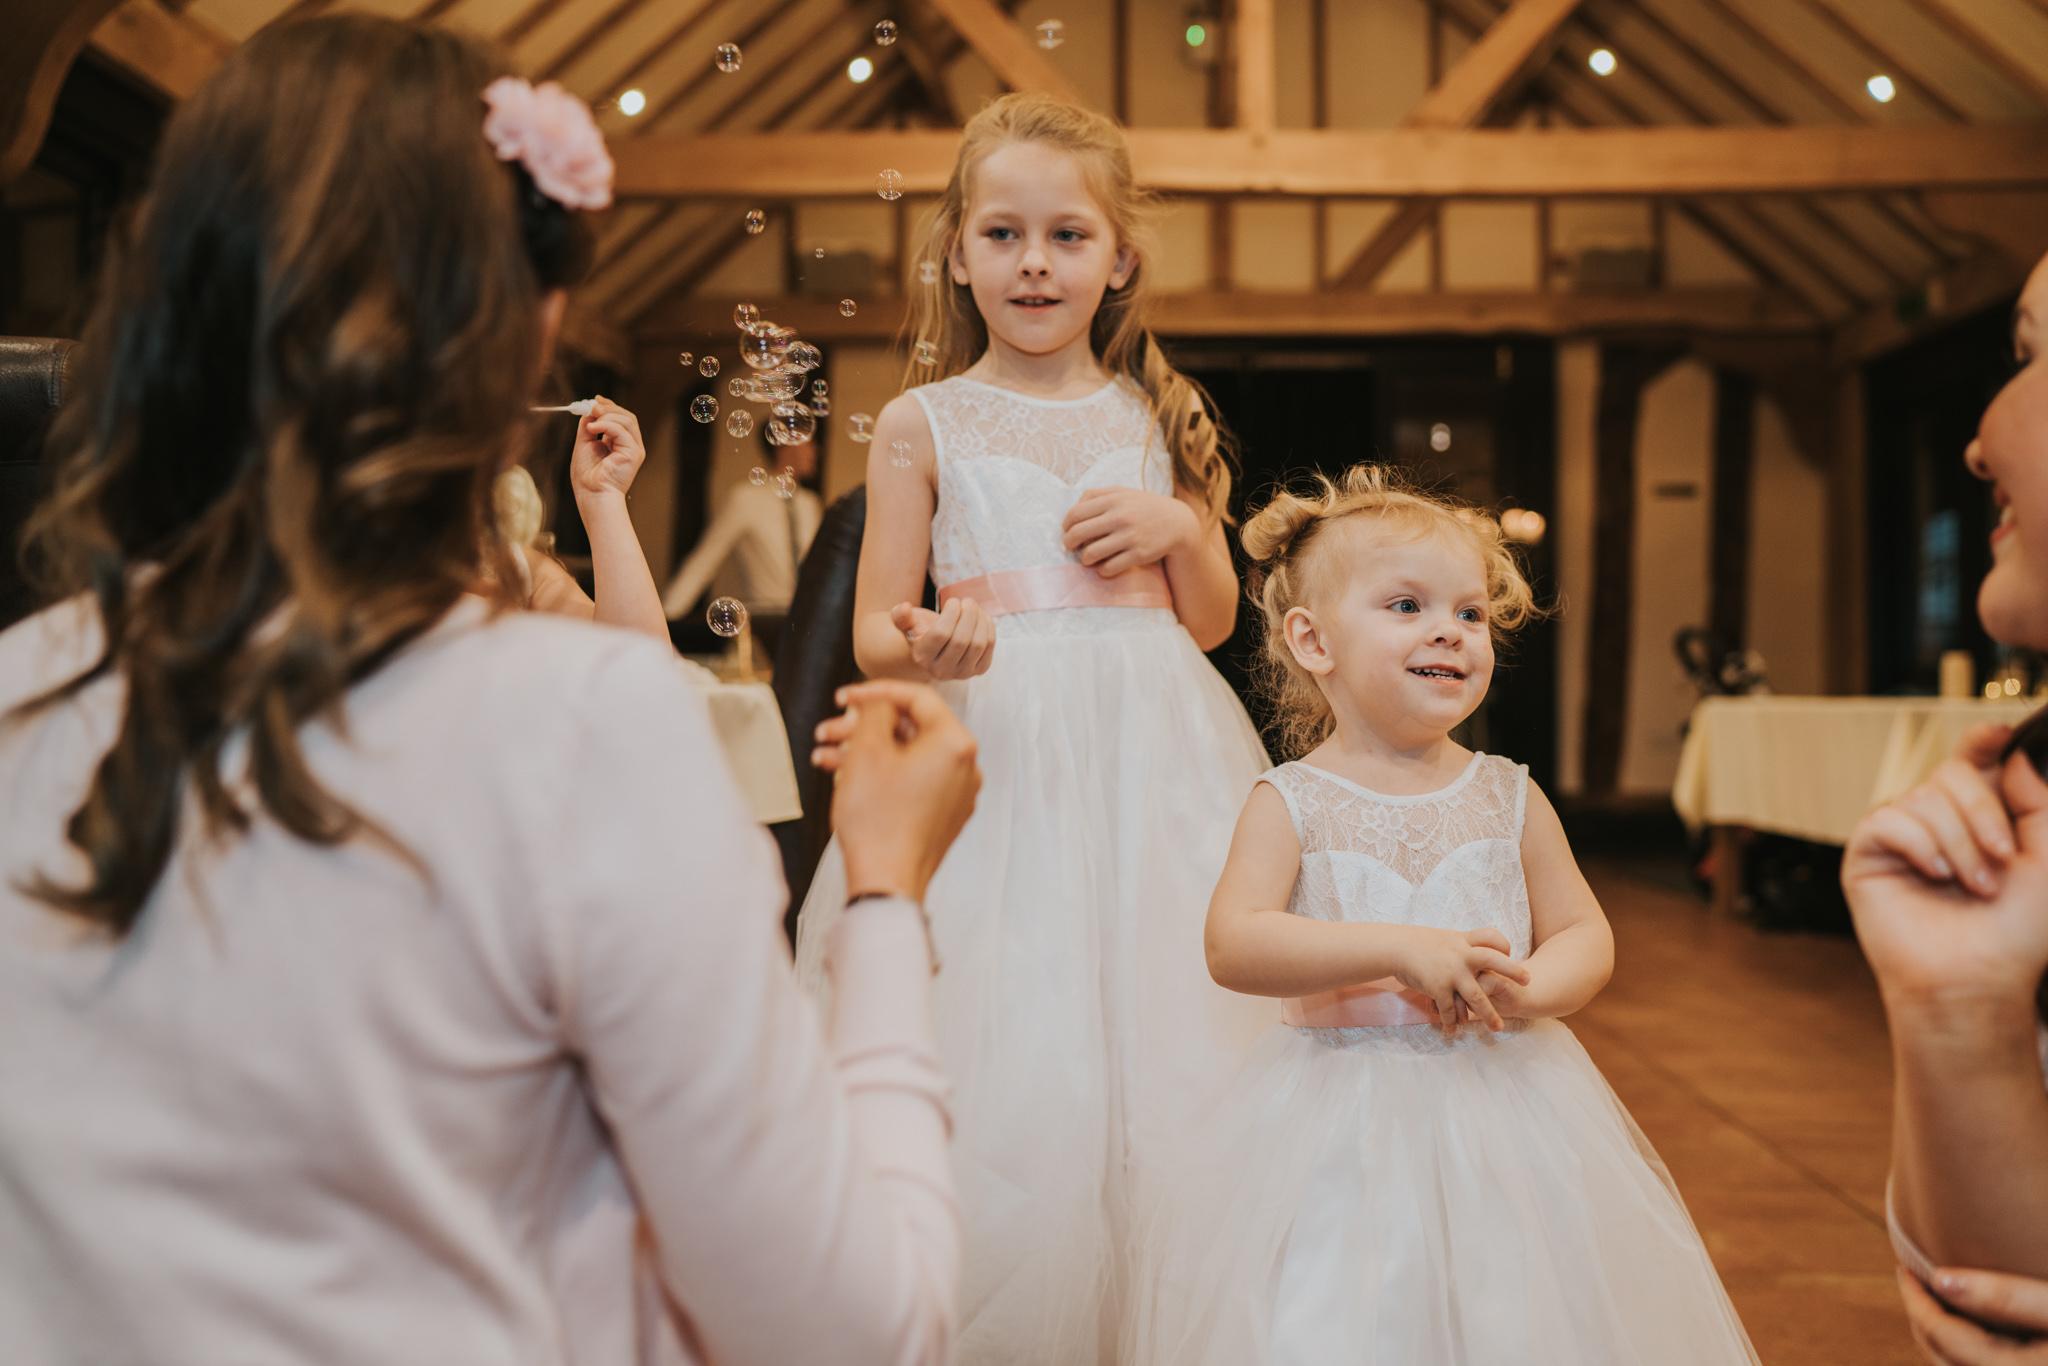 rhia-james-rustic-crabbs-barn-vintage-50s-retro-wedding-grace-elizabeth-colchester-essex-alternative-relaxed-wedding-family-photography-devon-suffolk-norfolk-essex (60 of 138).jpg